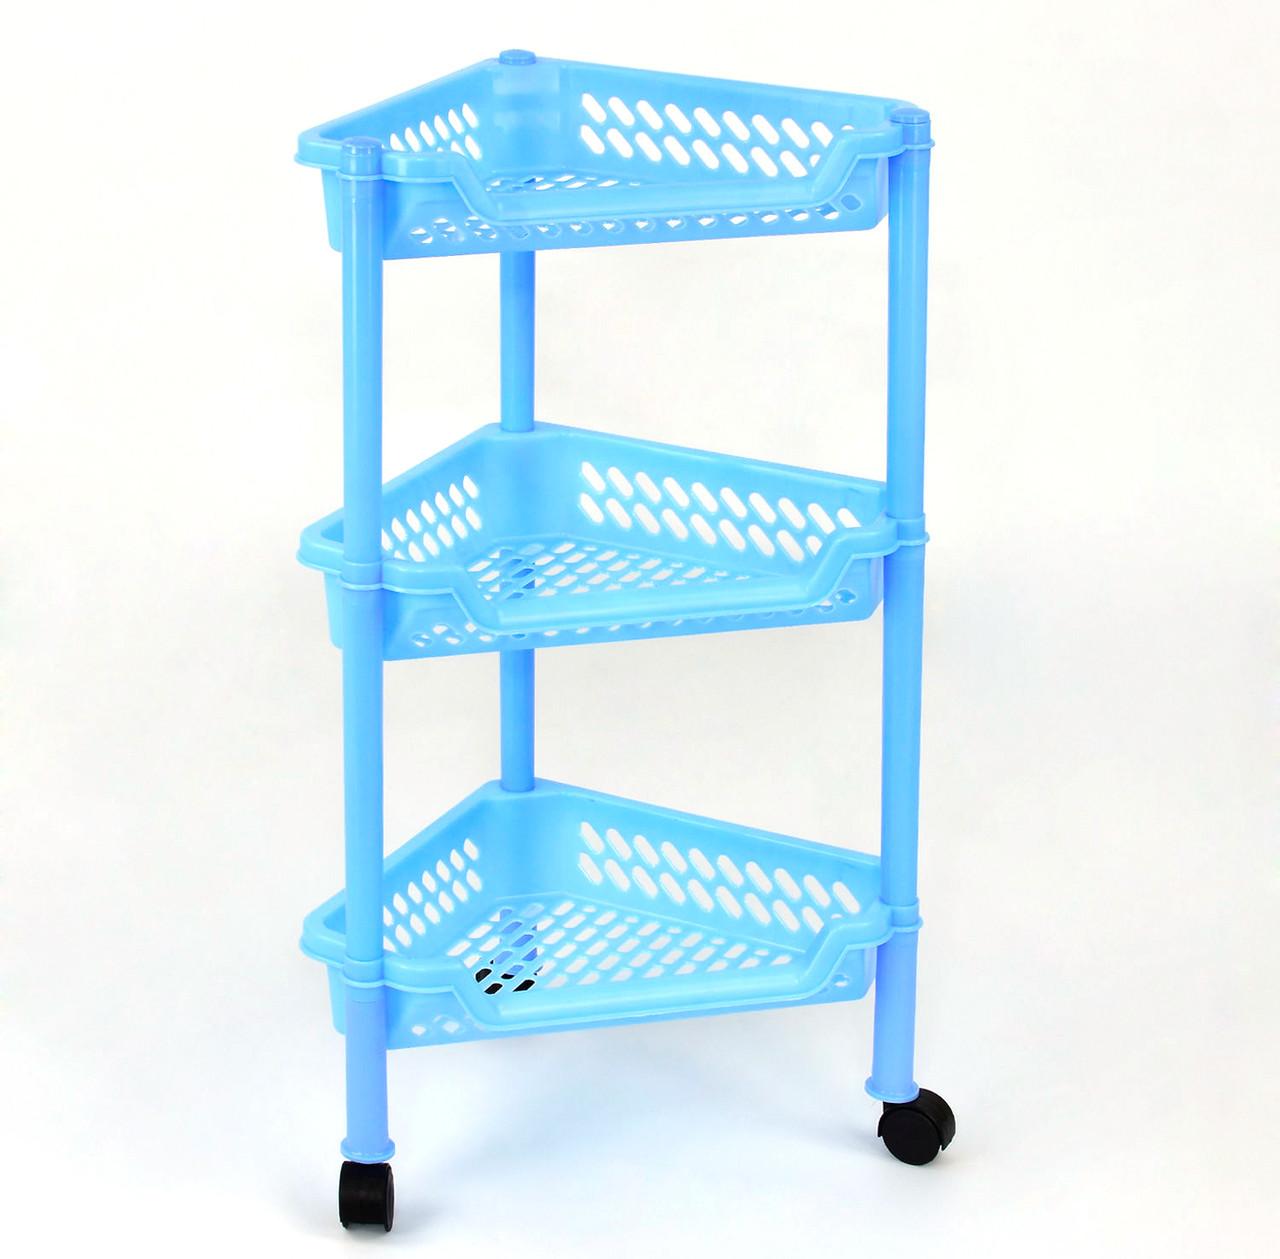 Етажерка кутова пласиковая блакитна